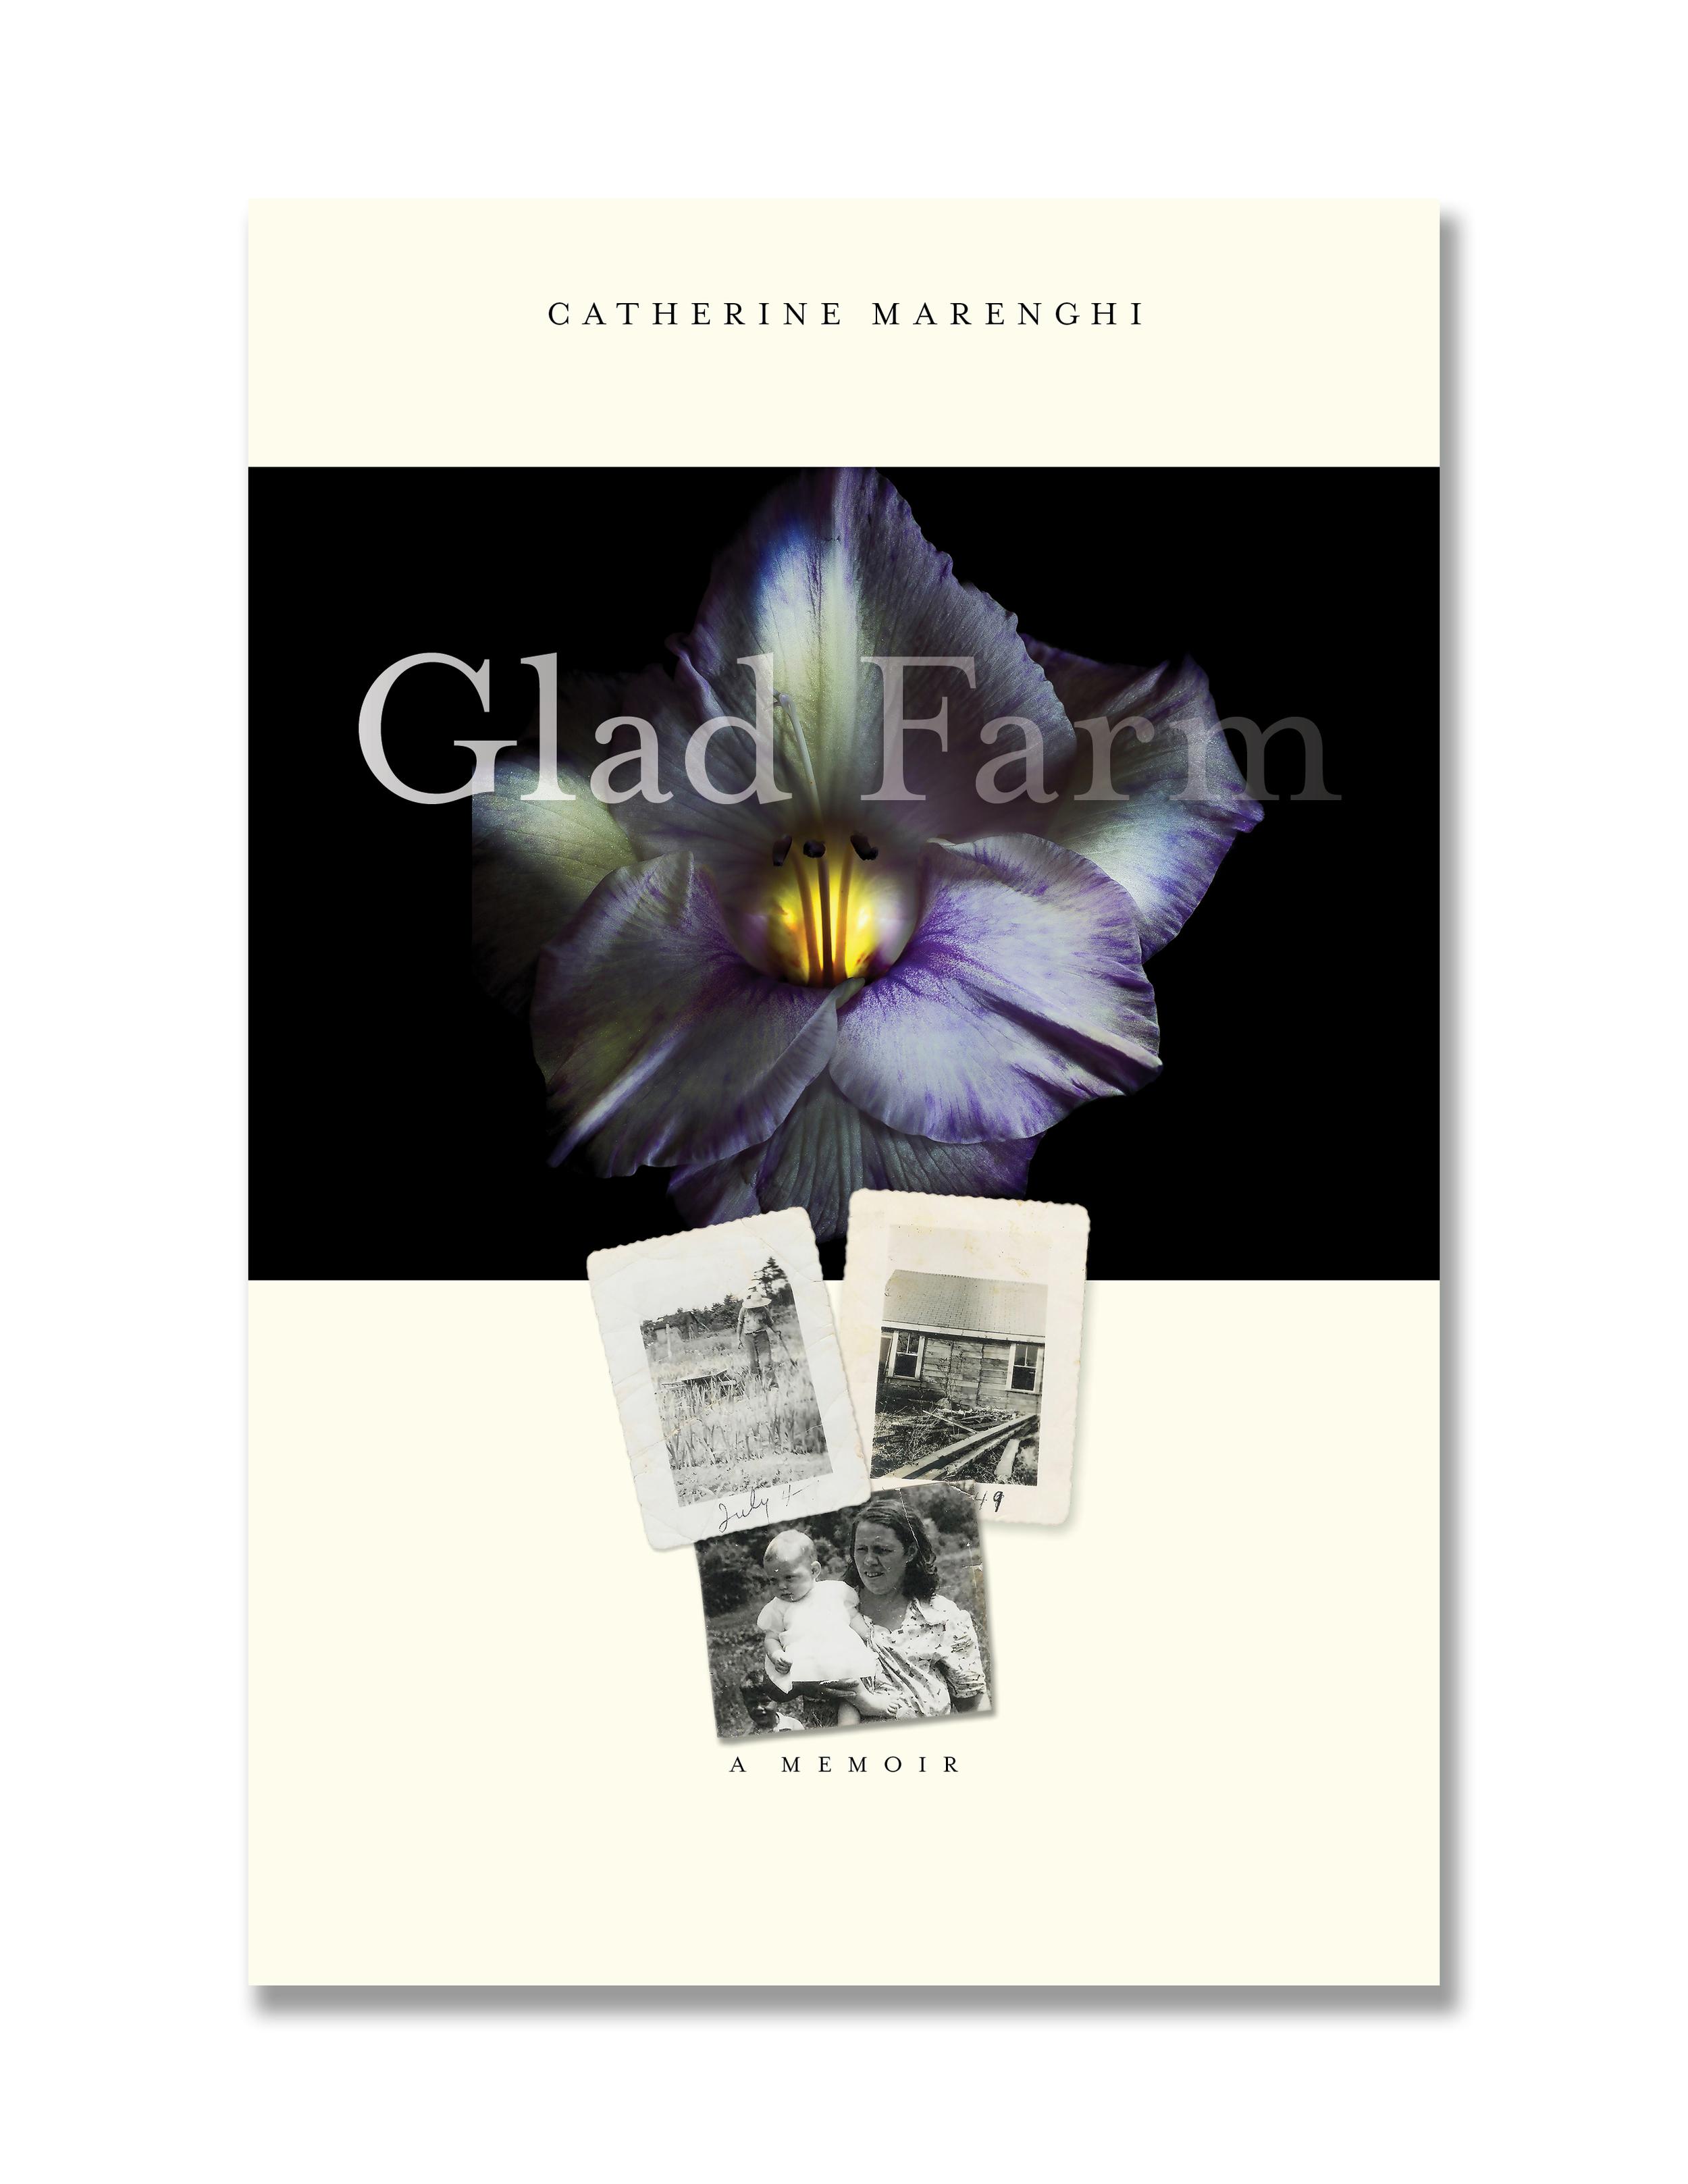 GLAD FARM: initial cover concept #1